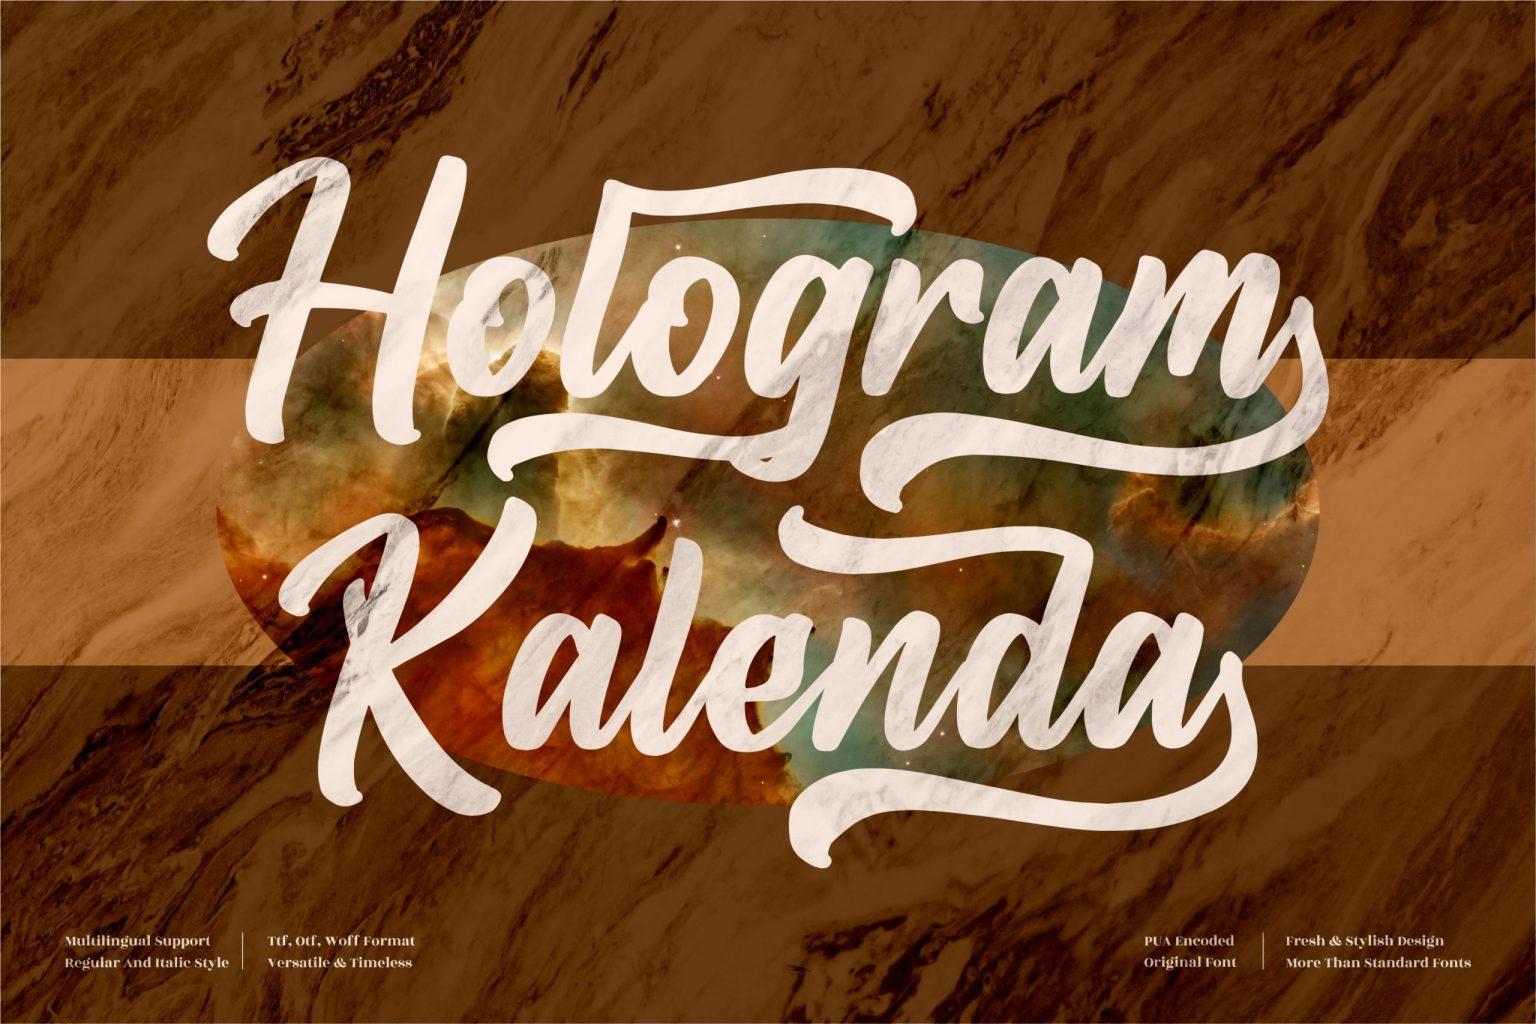 Hologram Kalenda Script Font